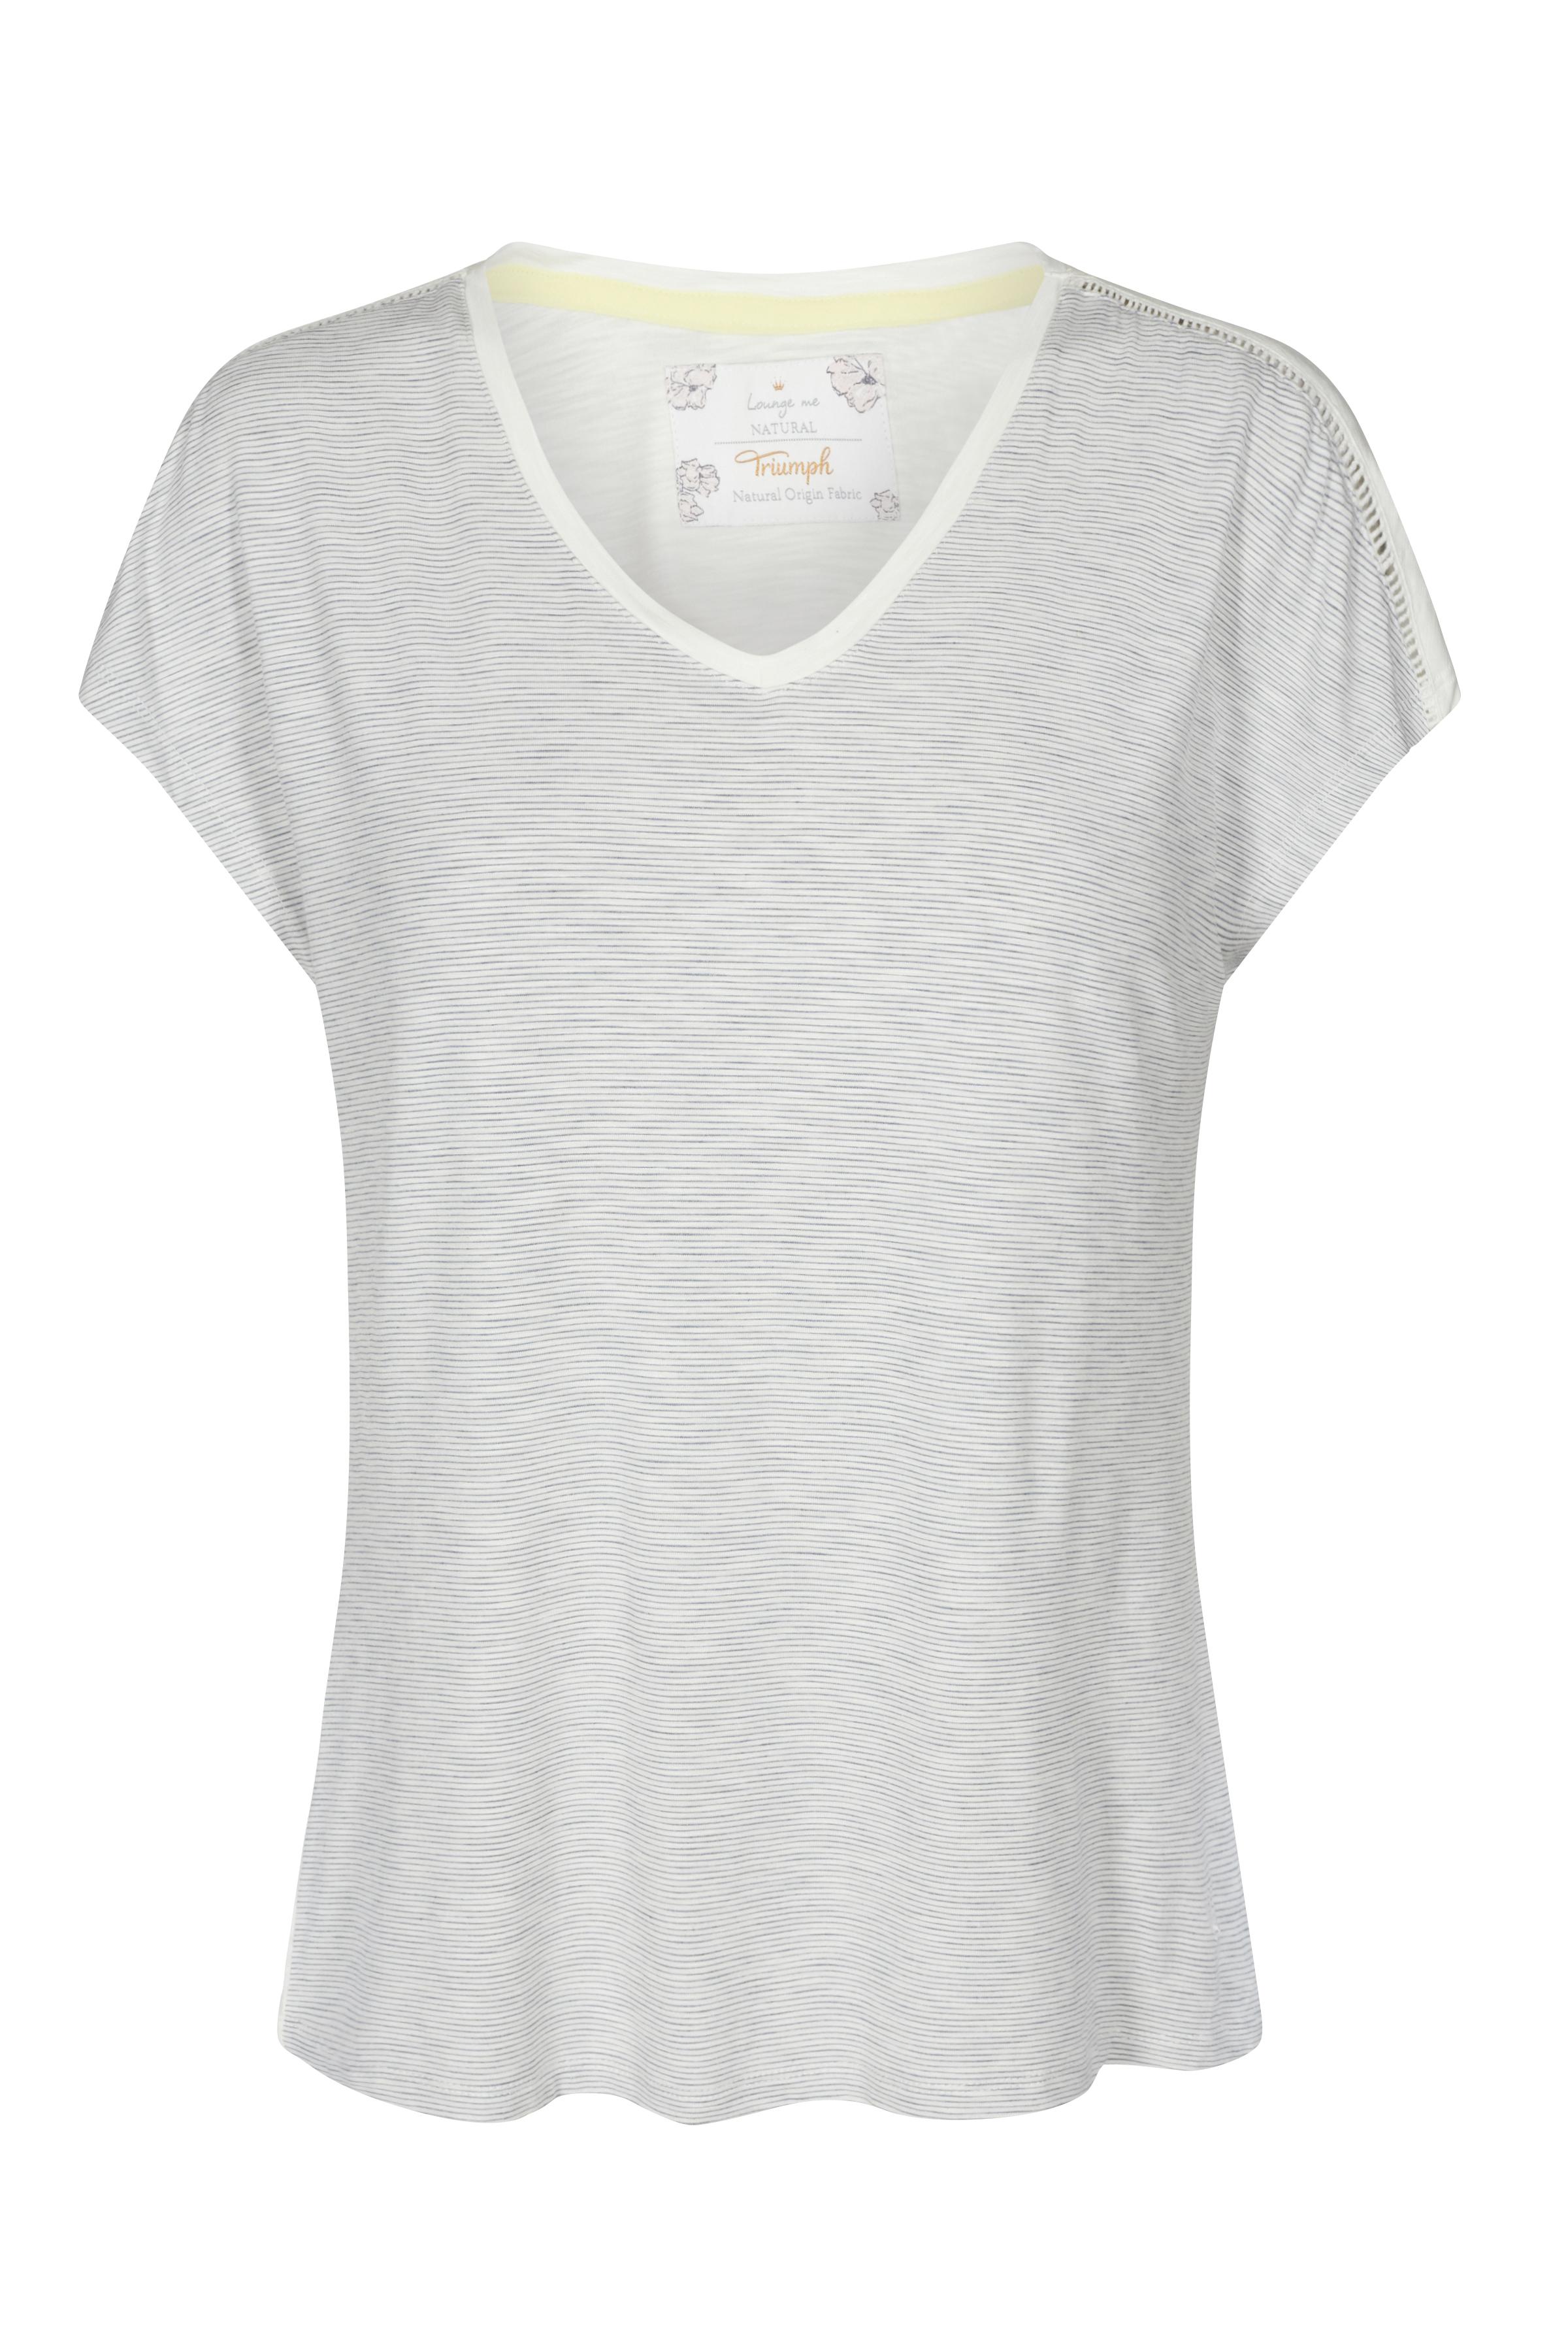 Image of Triumph Dame Homewear sæt - Off-white/grå